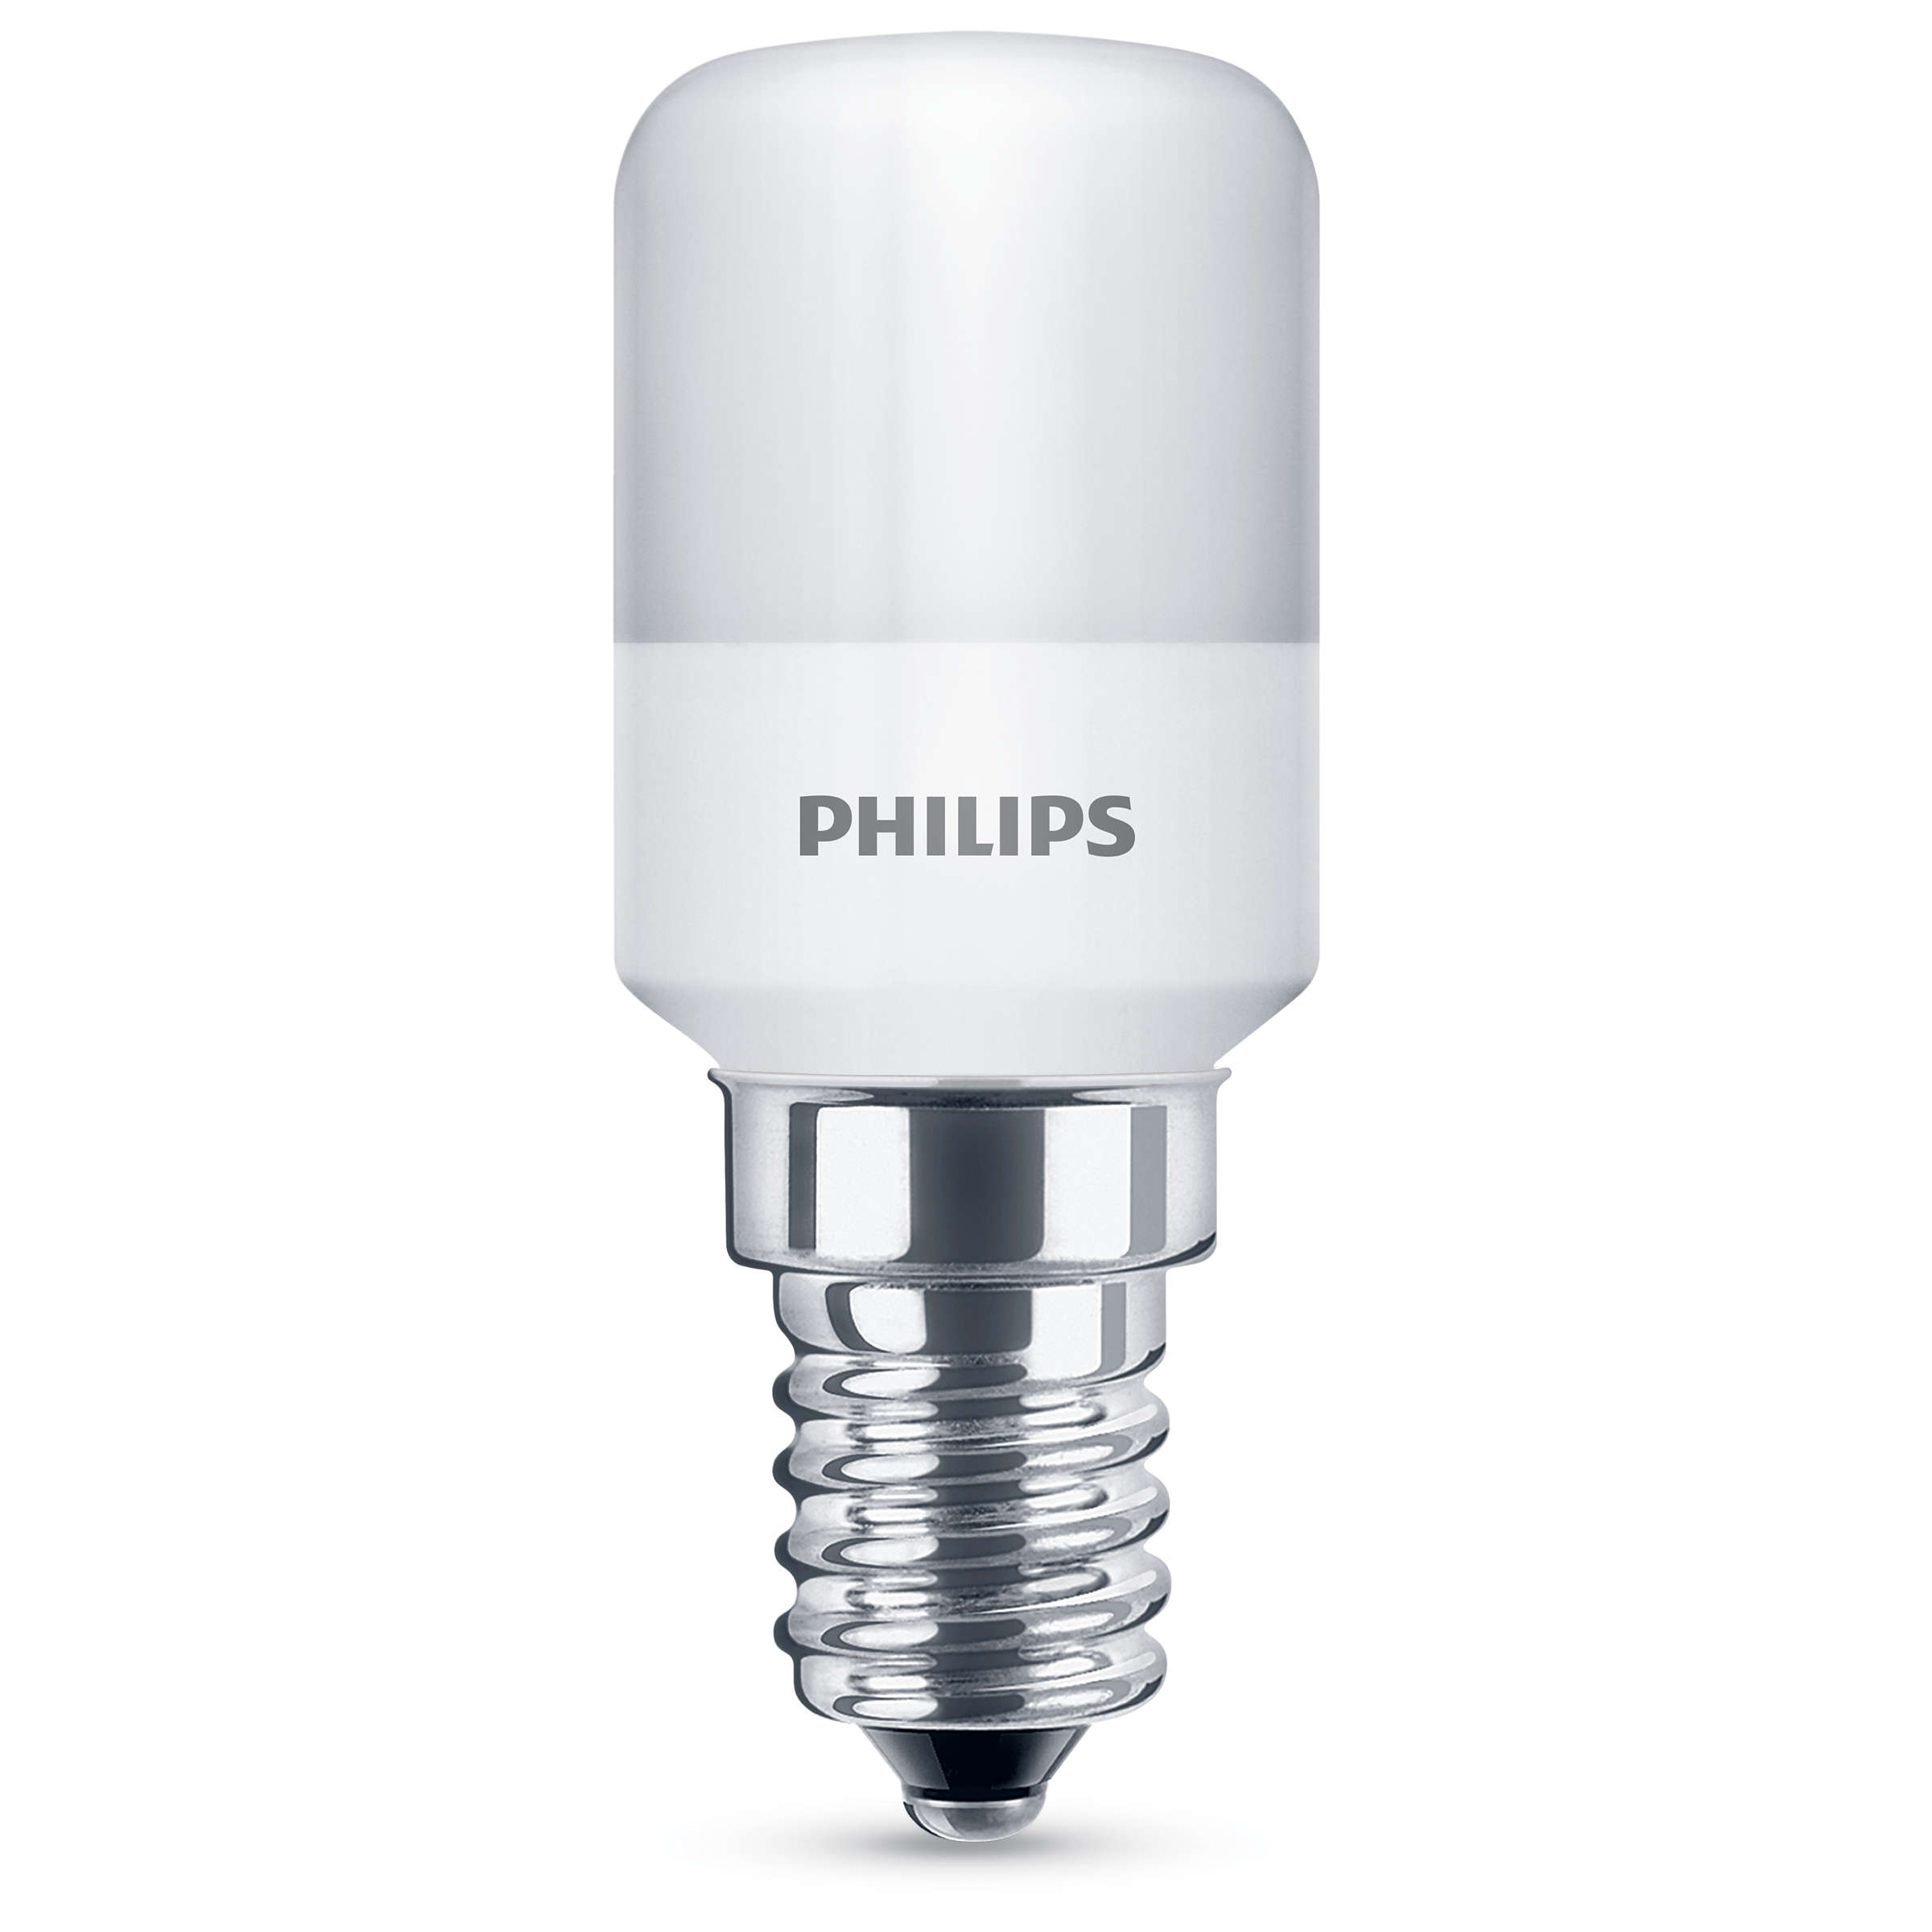 2 X Philips Led T25 Frosted E14 Edison 15w Appliance Fridge Light Bulbs 136lm Ebay